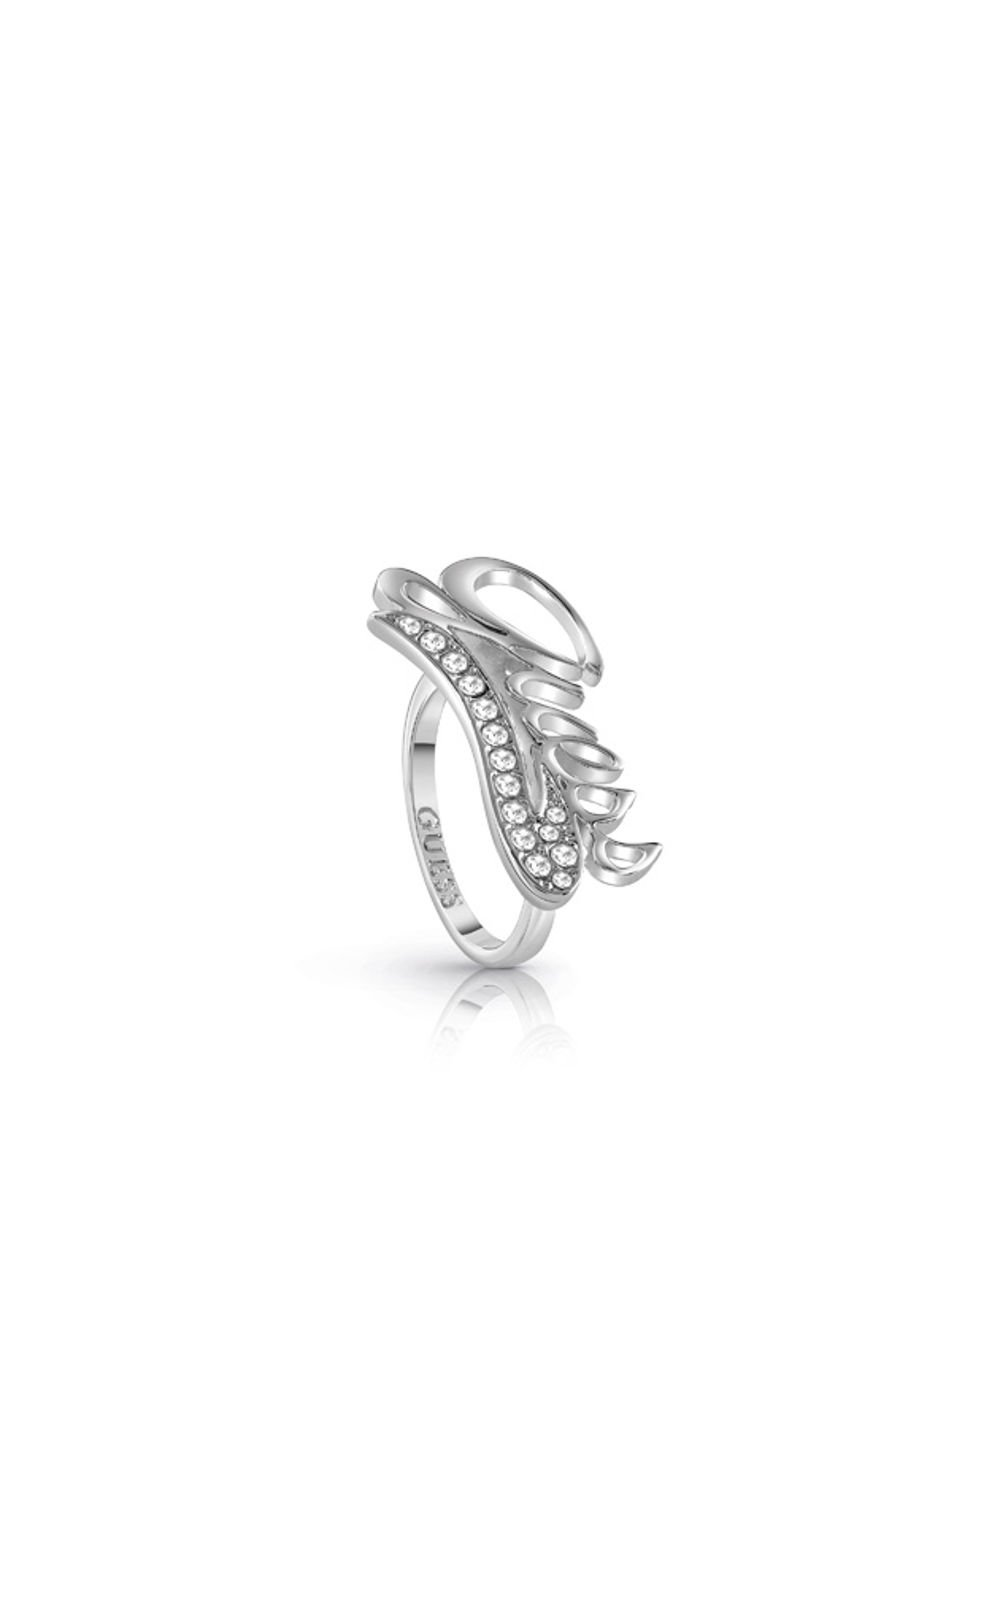 GUESS FAUX UBR85041-54 Ασημένιο Δαχτυλίδι Με Λογότυπο